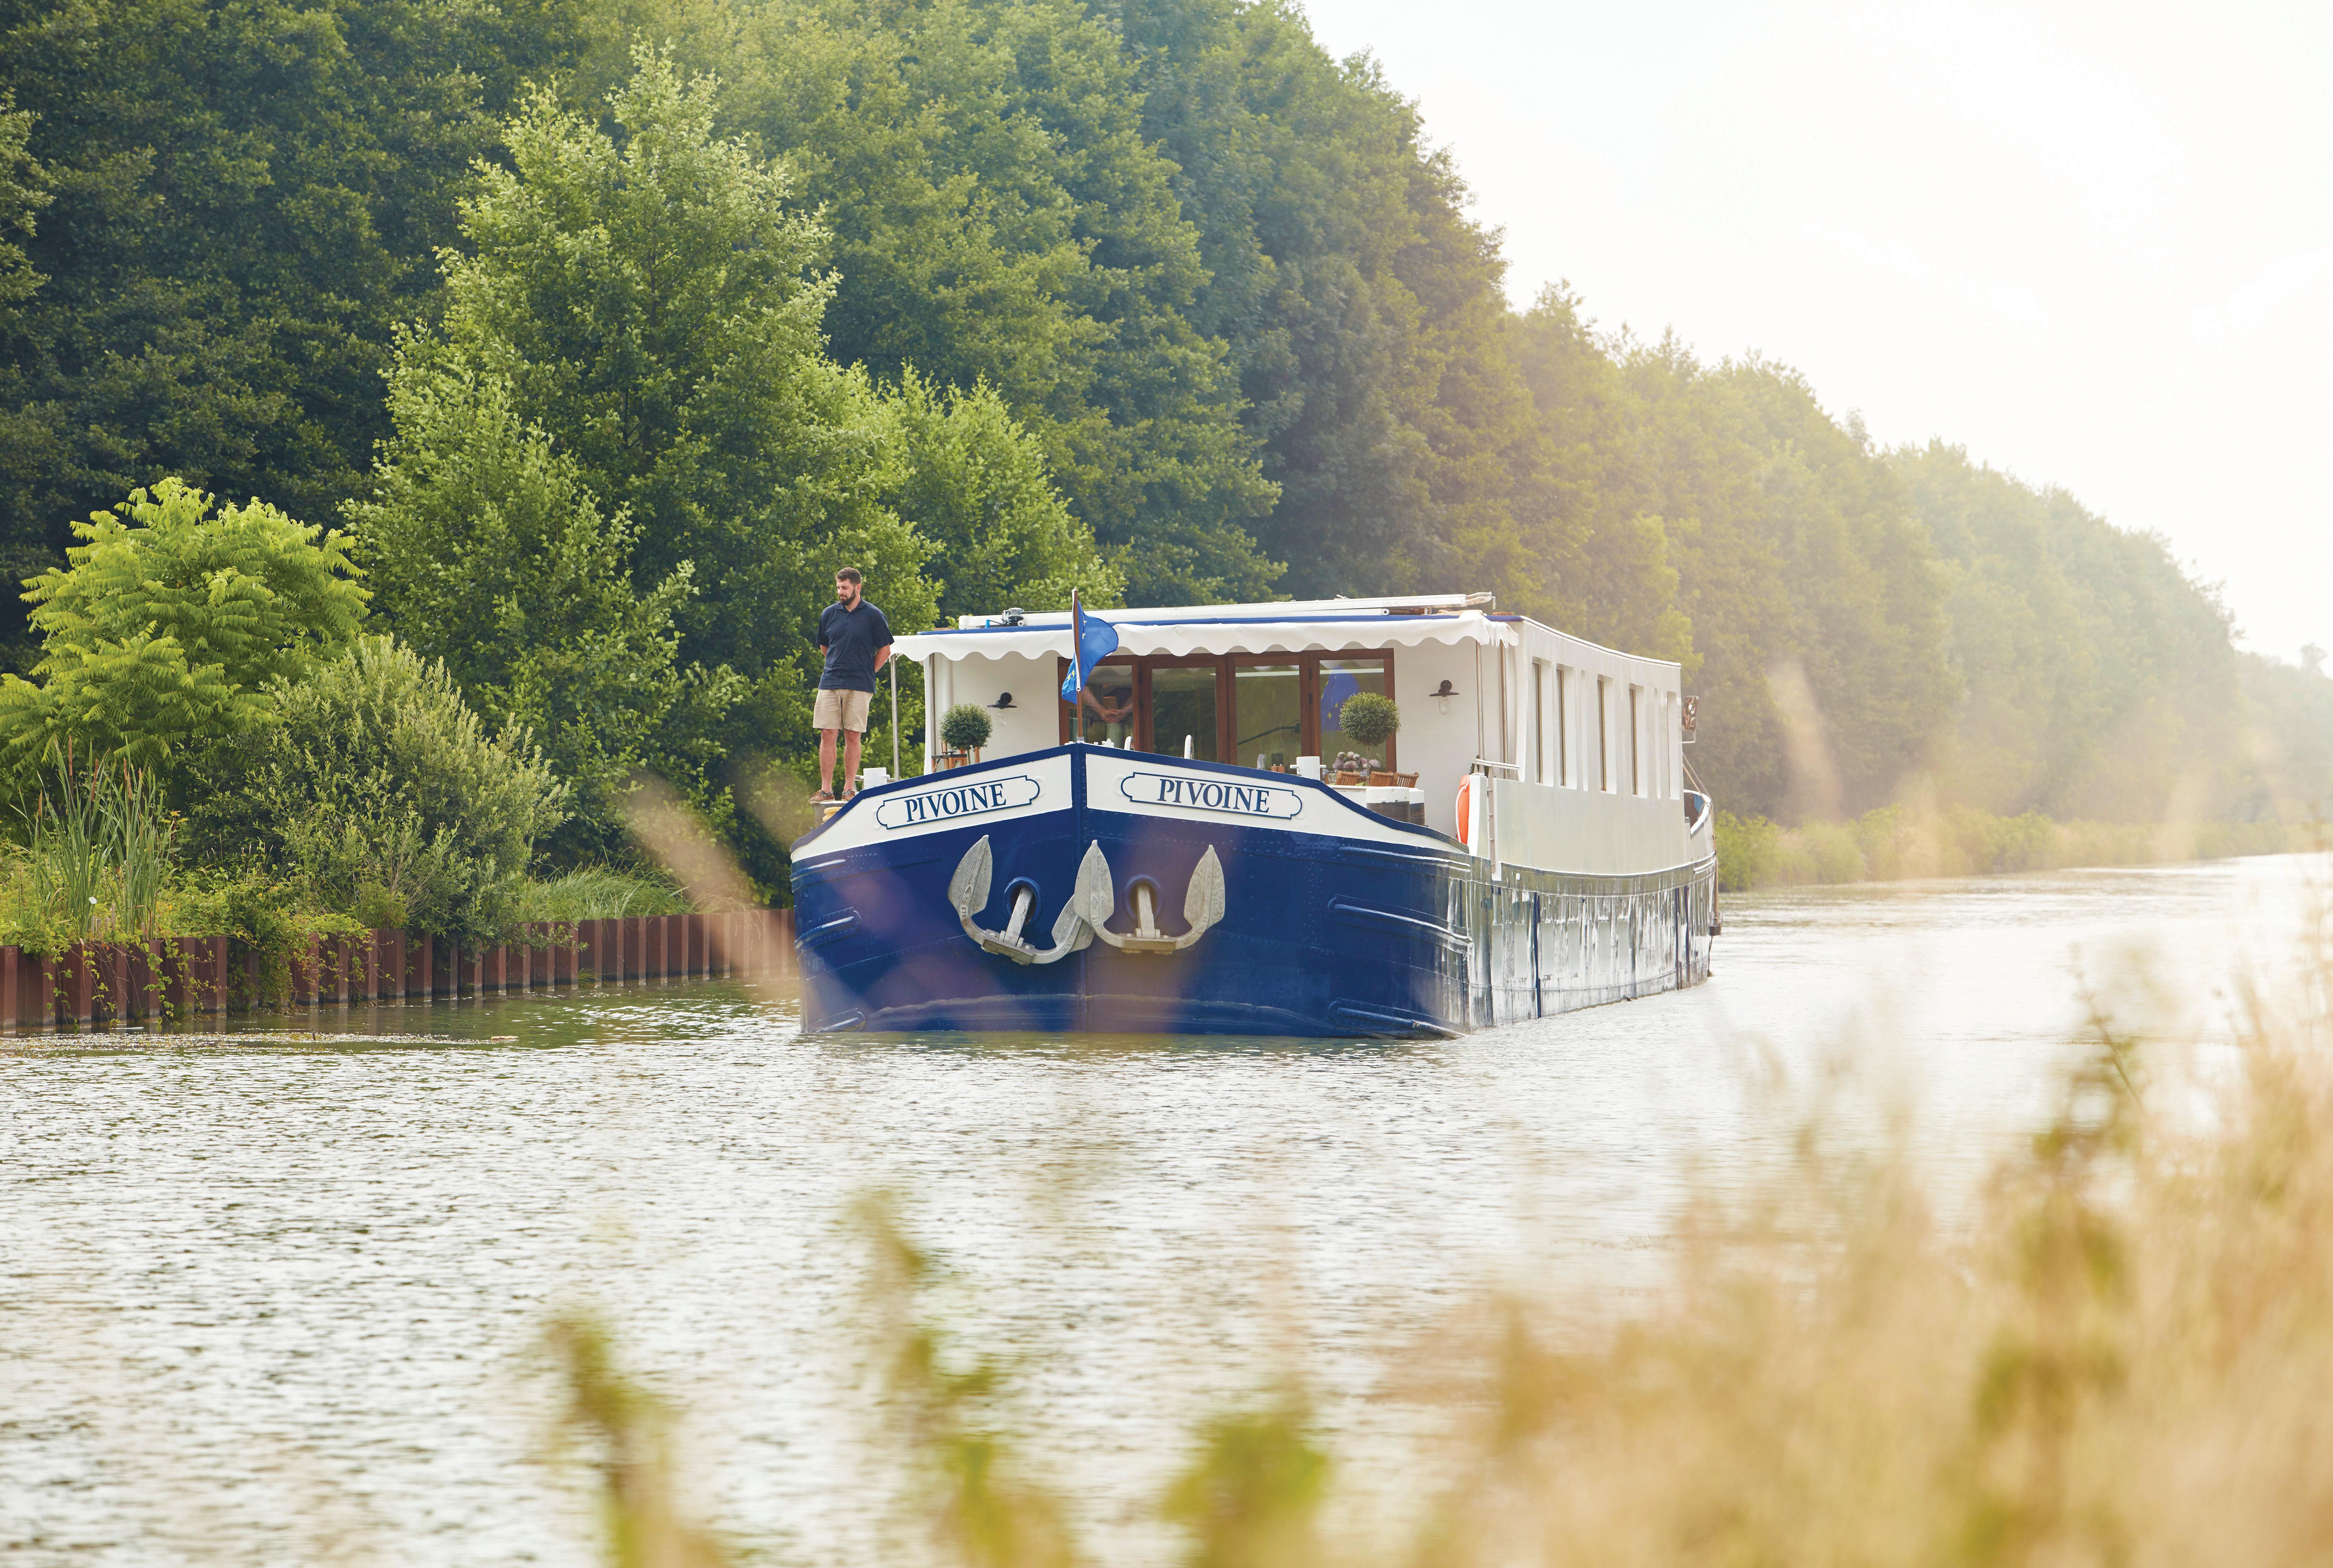 belmond-pivoine-luxury-cruise